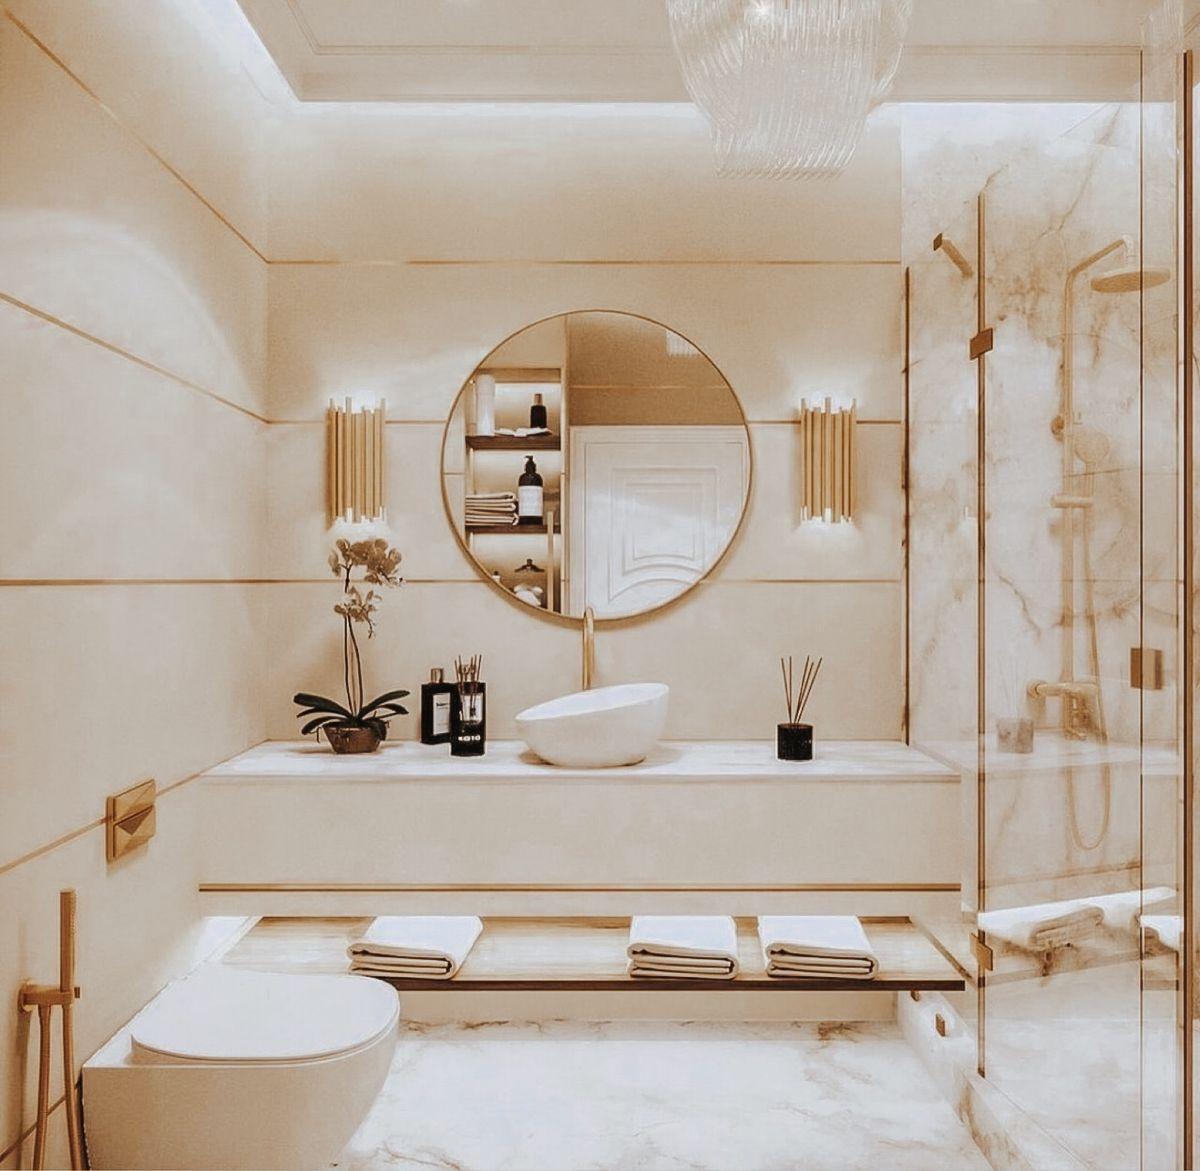 Pin By Presetworldco Lightroom Preset On House In 2021 Bathroom Design Decor Elegant Bathroom Design Architecture Bathroom Design Abela total bathroom renovations